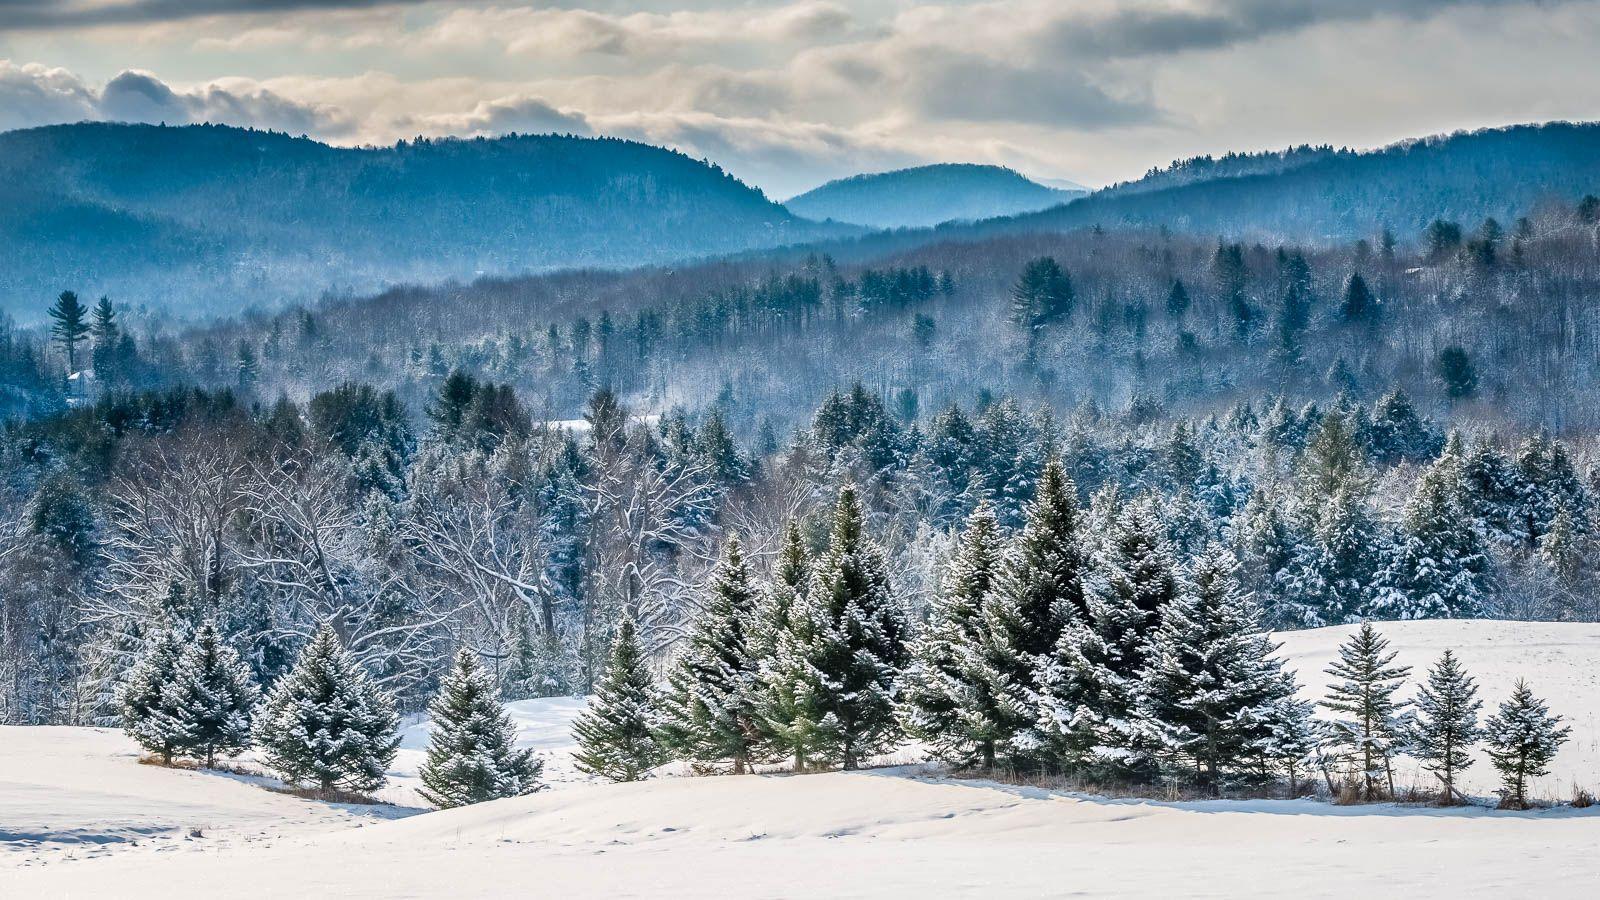 Vermont Snow Wallpapers - Top Free Vermont Snow ...